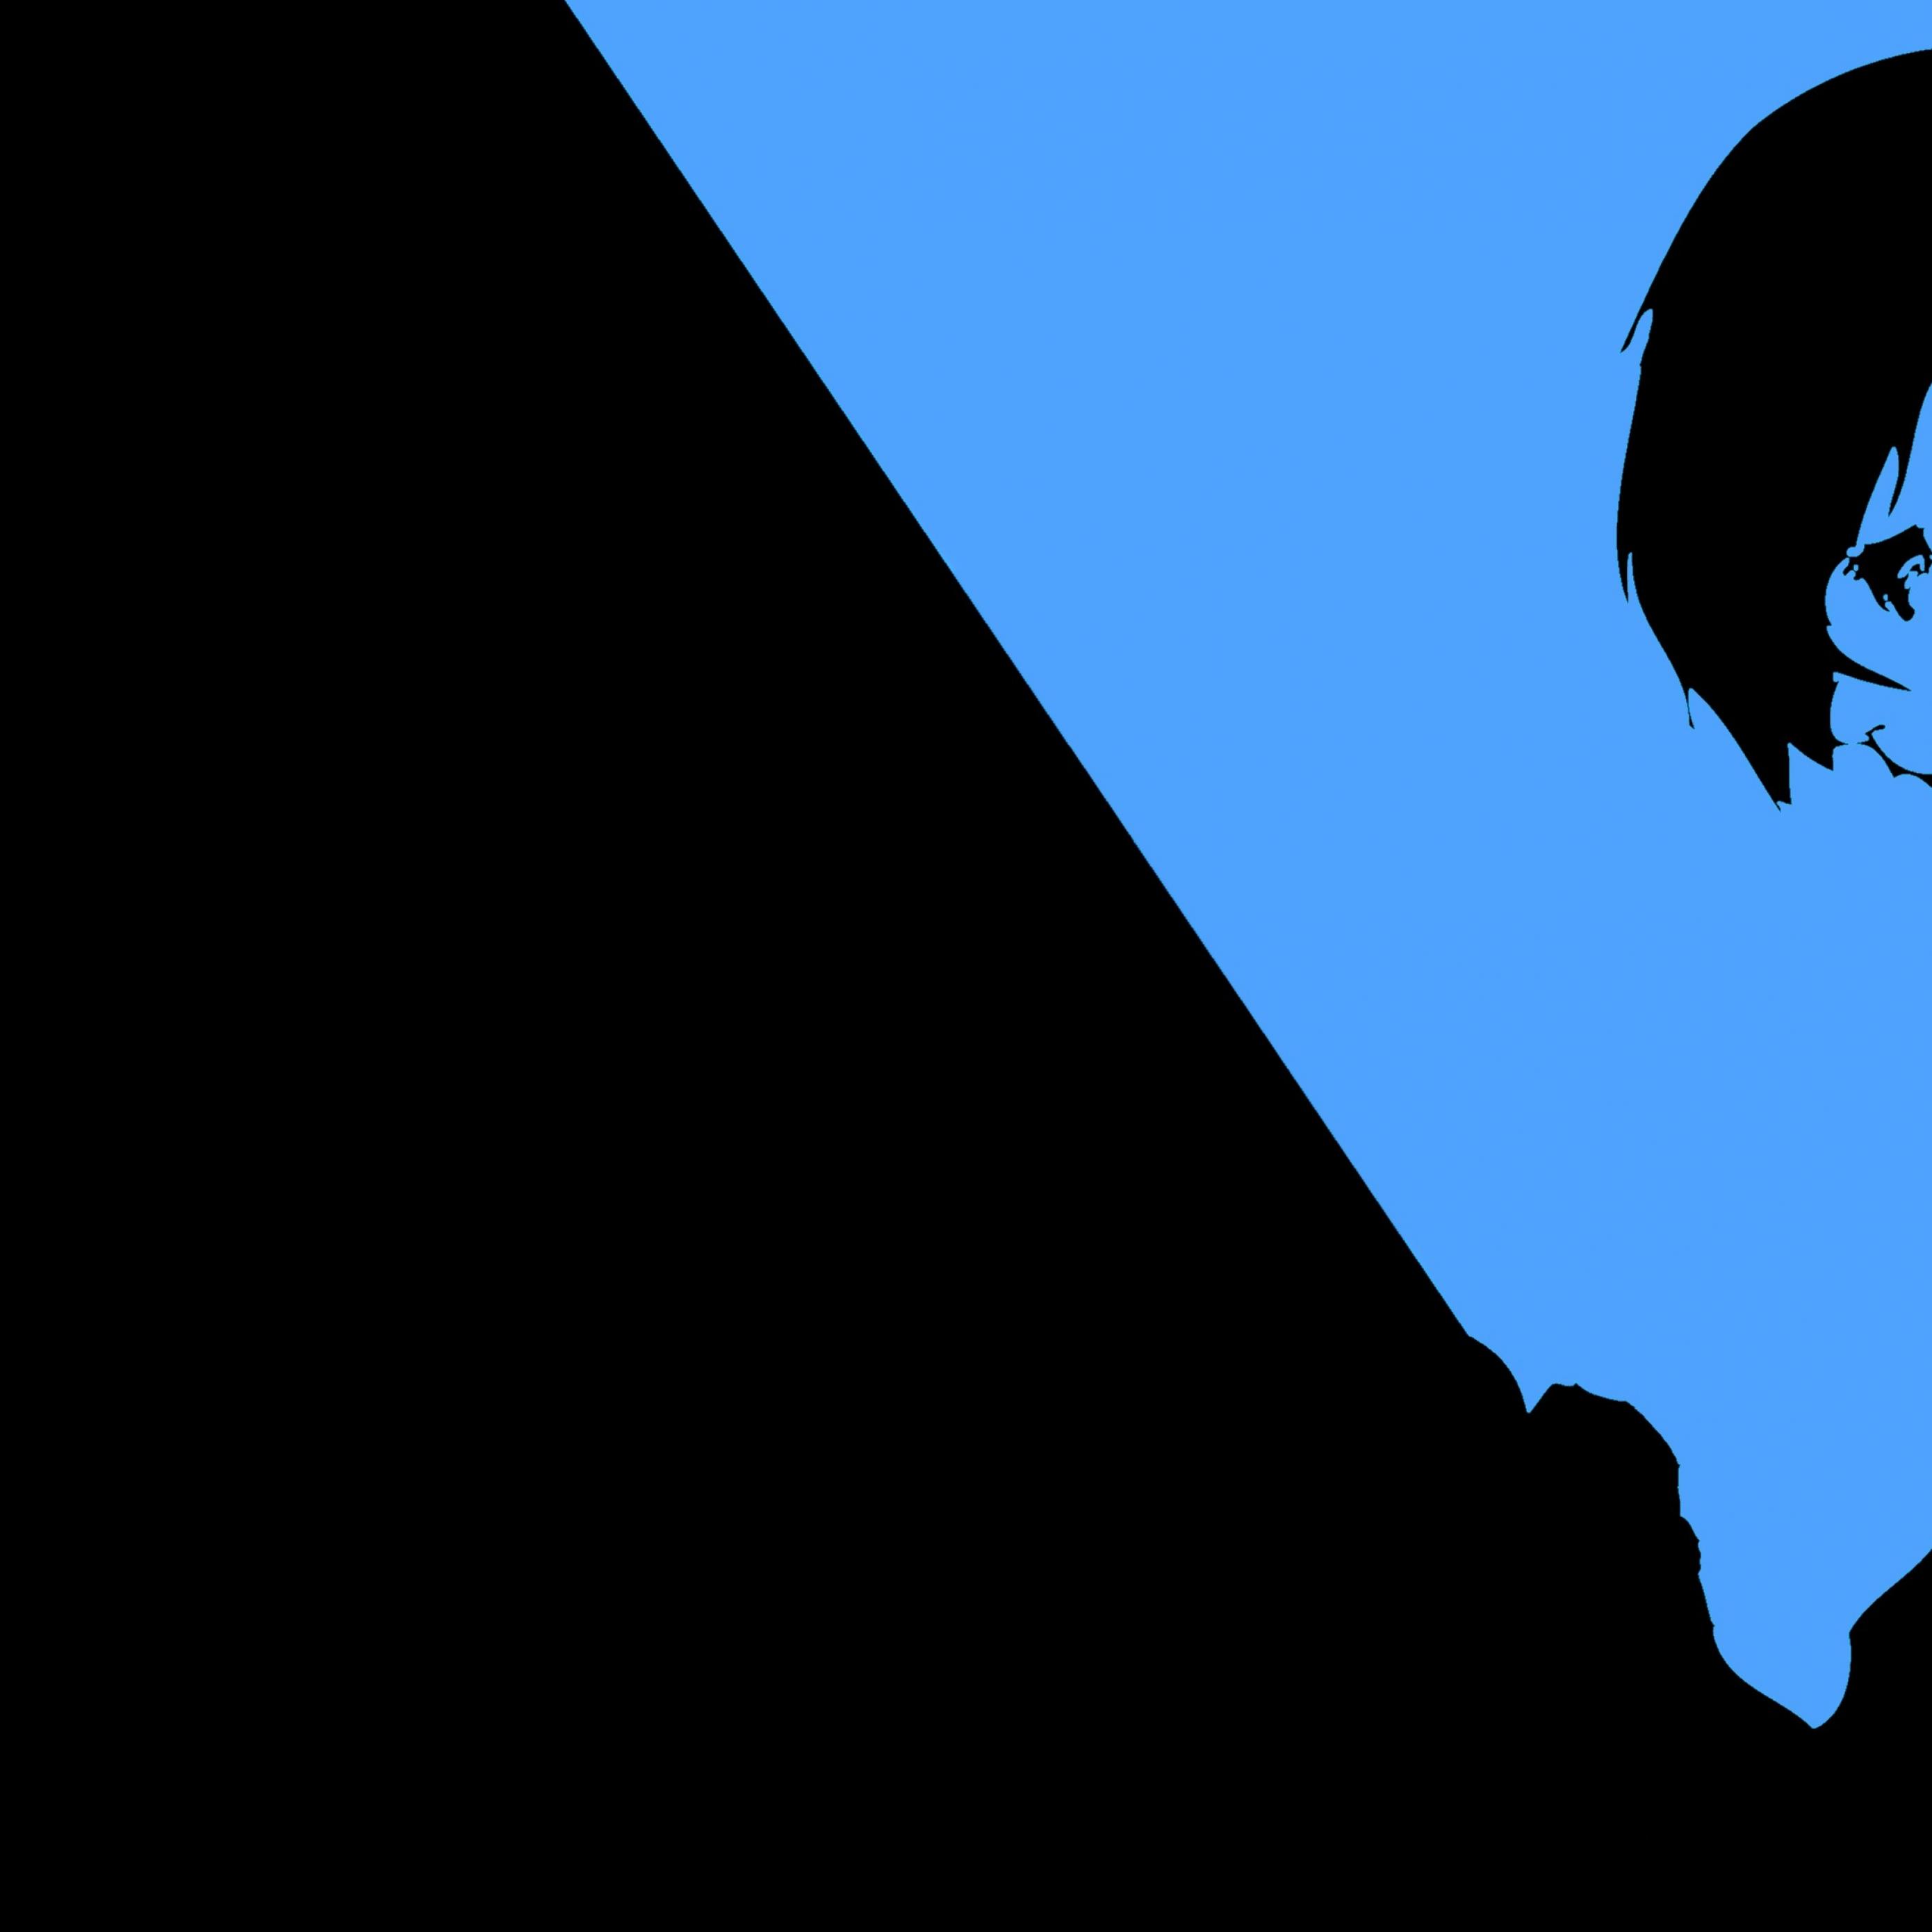 Download Minato Arisato Protagonist Persona 3 Apple iPad Air 2780x2780